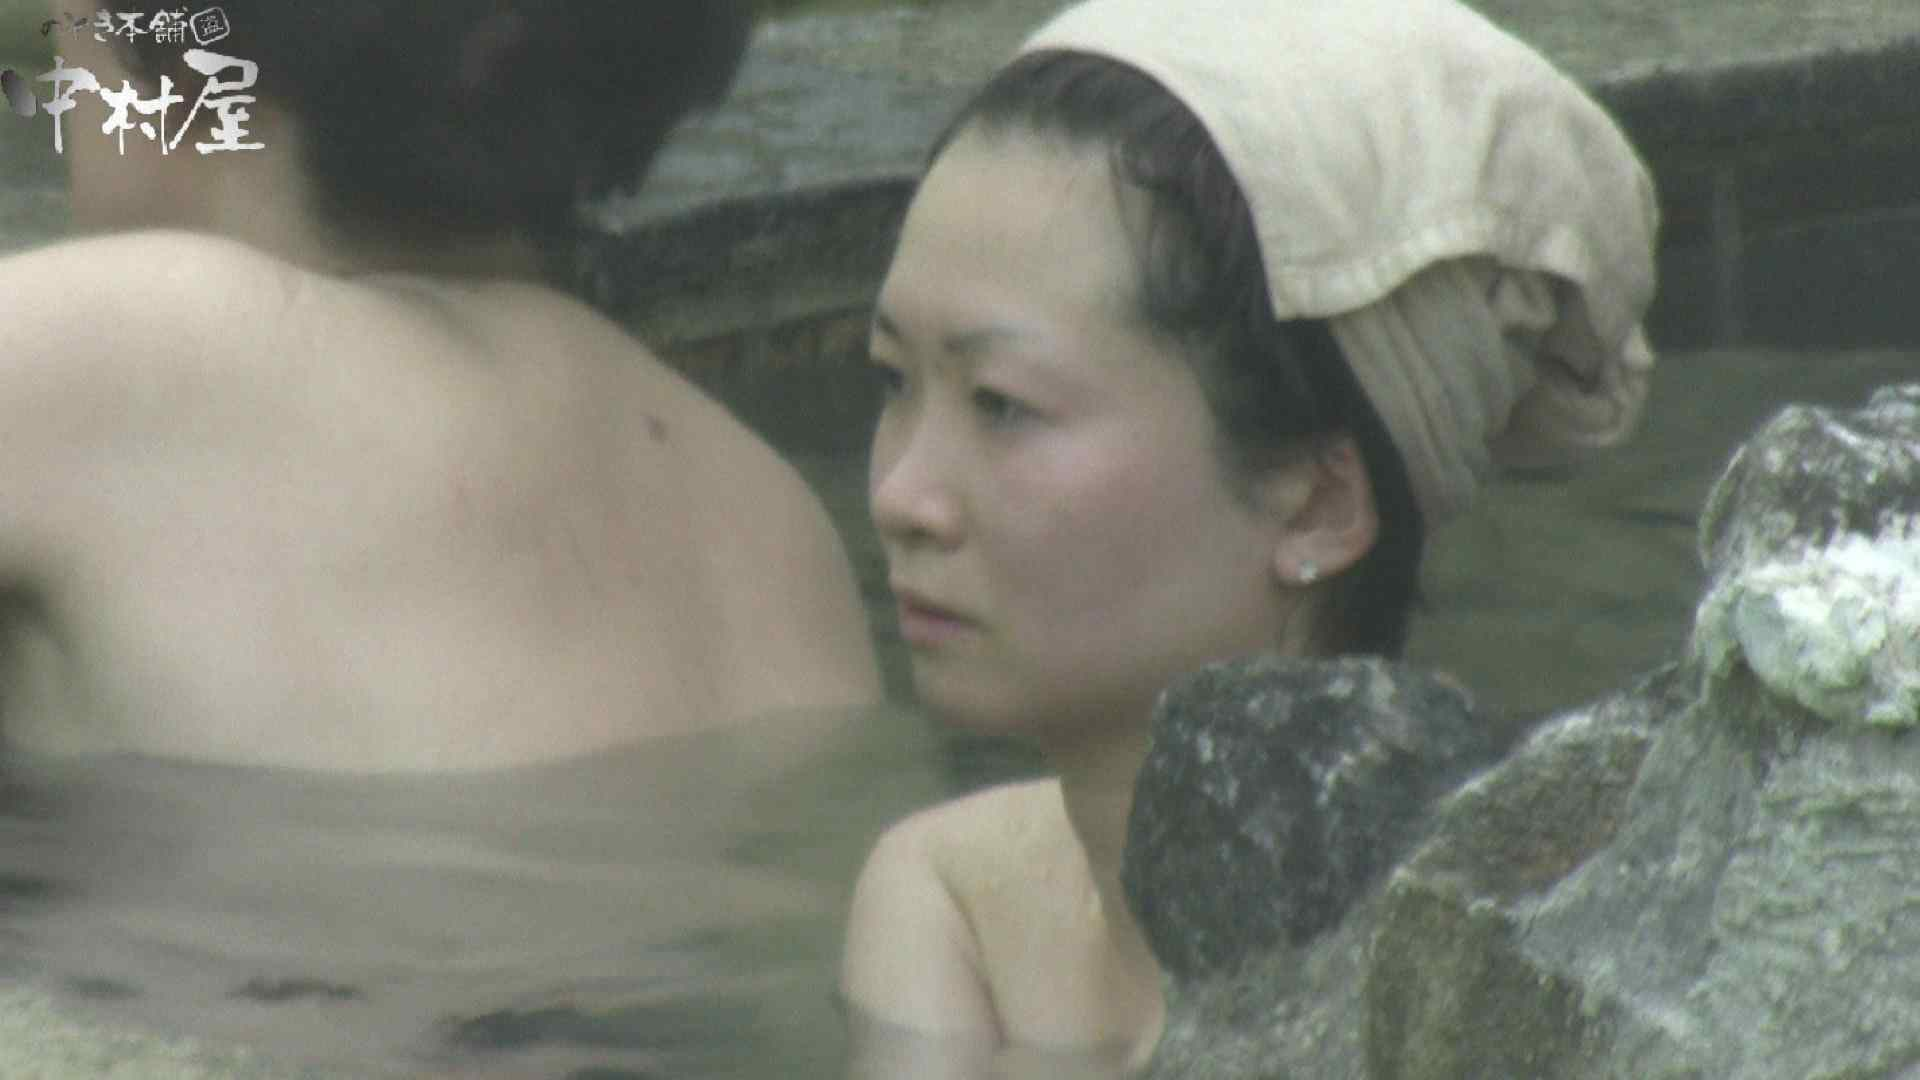 Aquaな露天風呂Vol.906 露天風呂編  86PIX 84